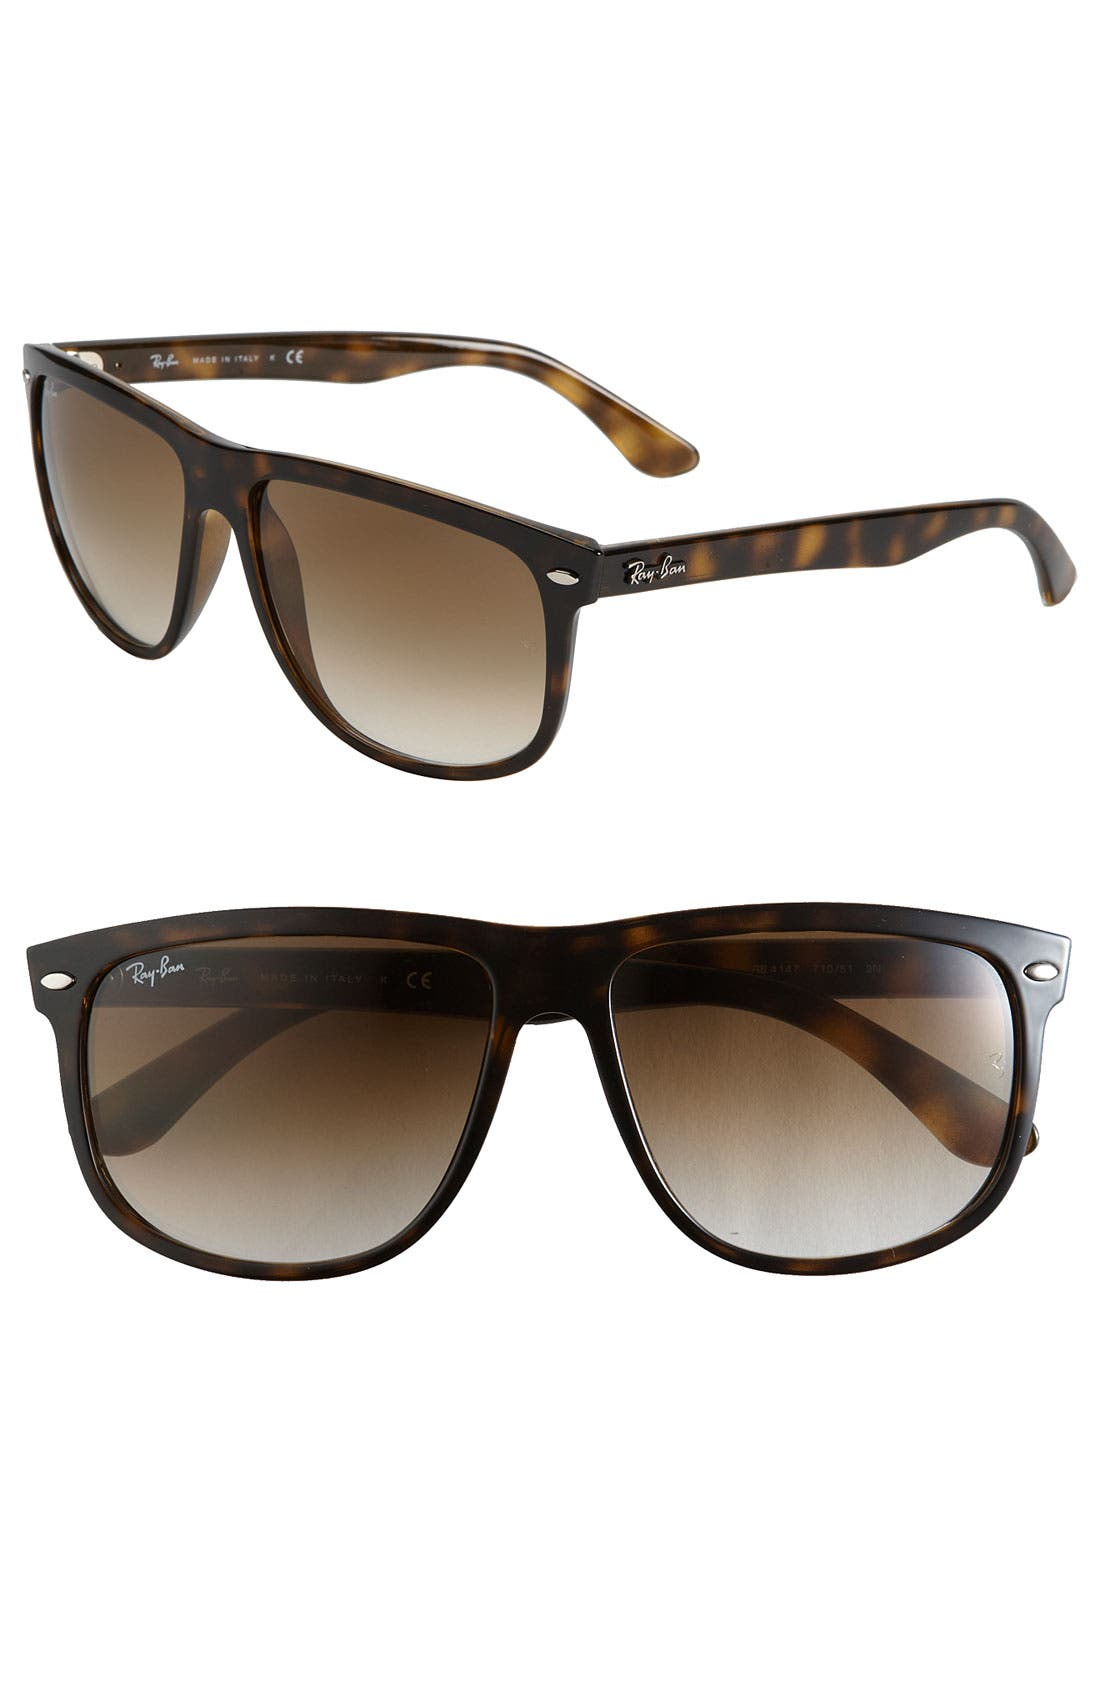 flat top sunglasses  Ray-Ban Boyfriend 60mm Flat Top Sunglasses